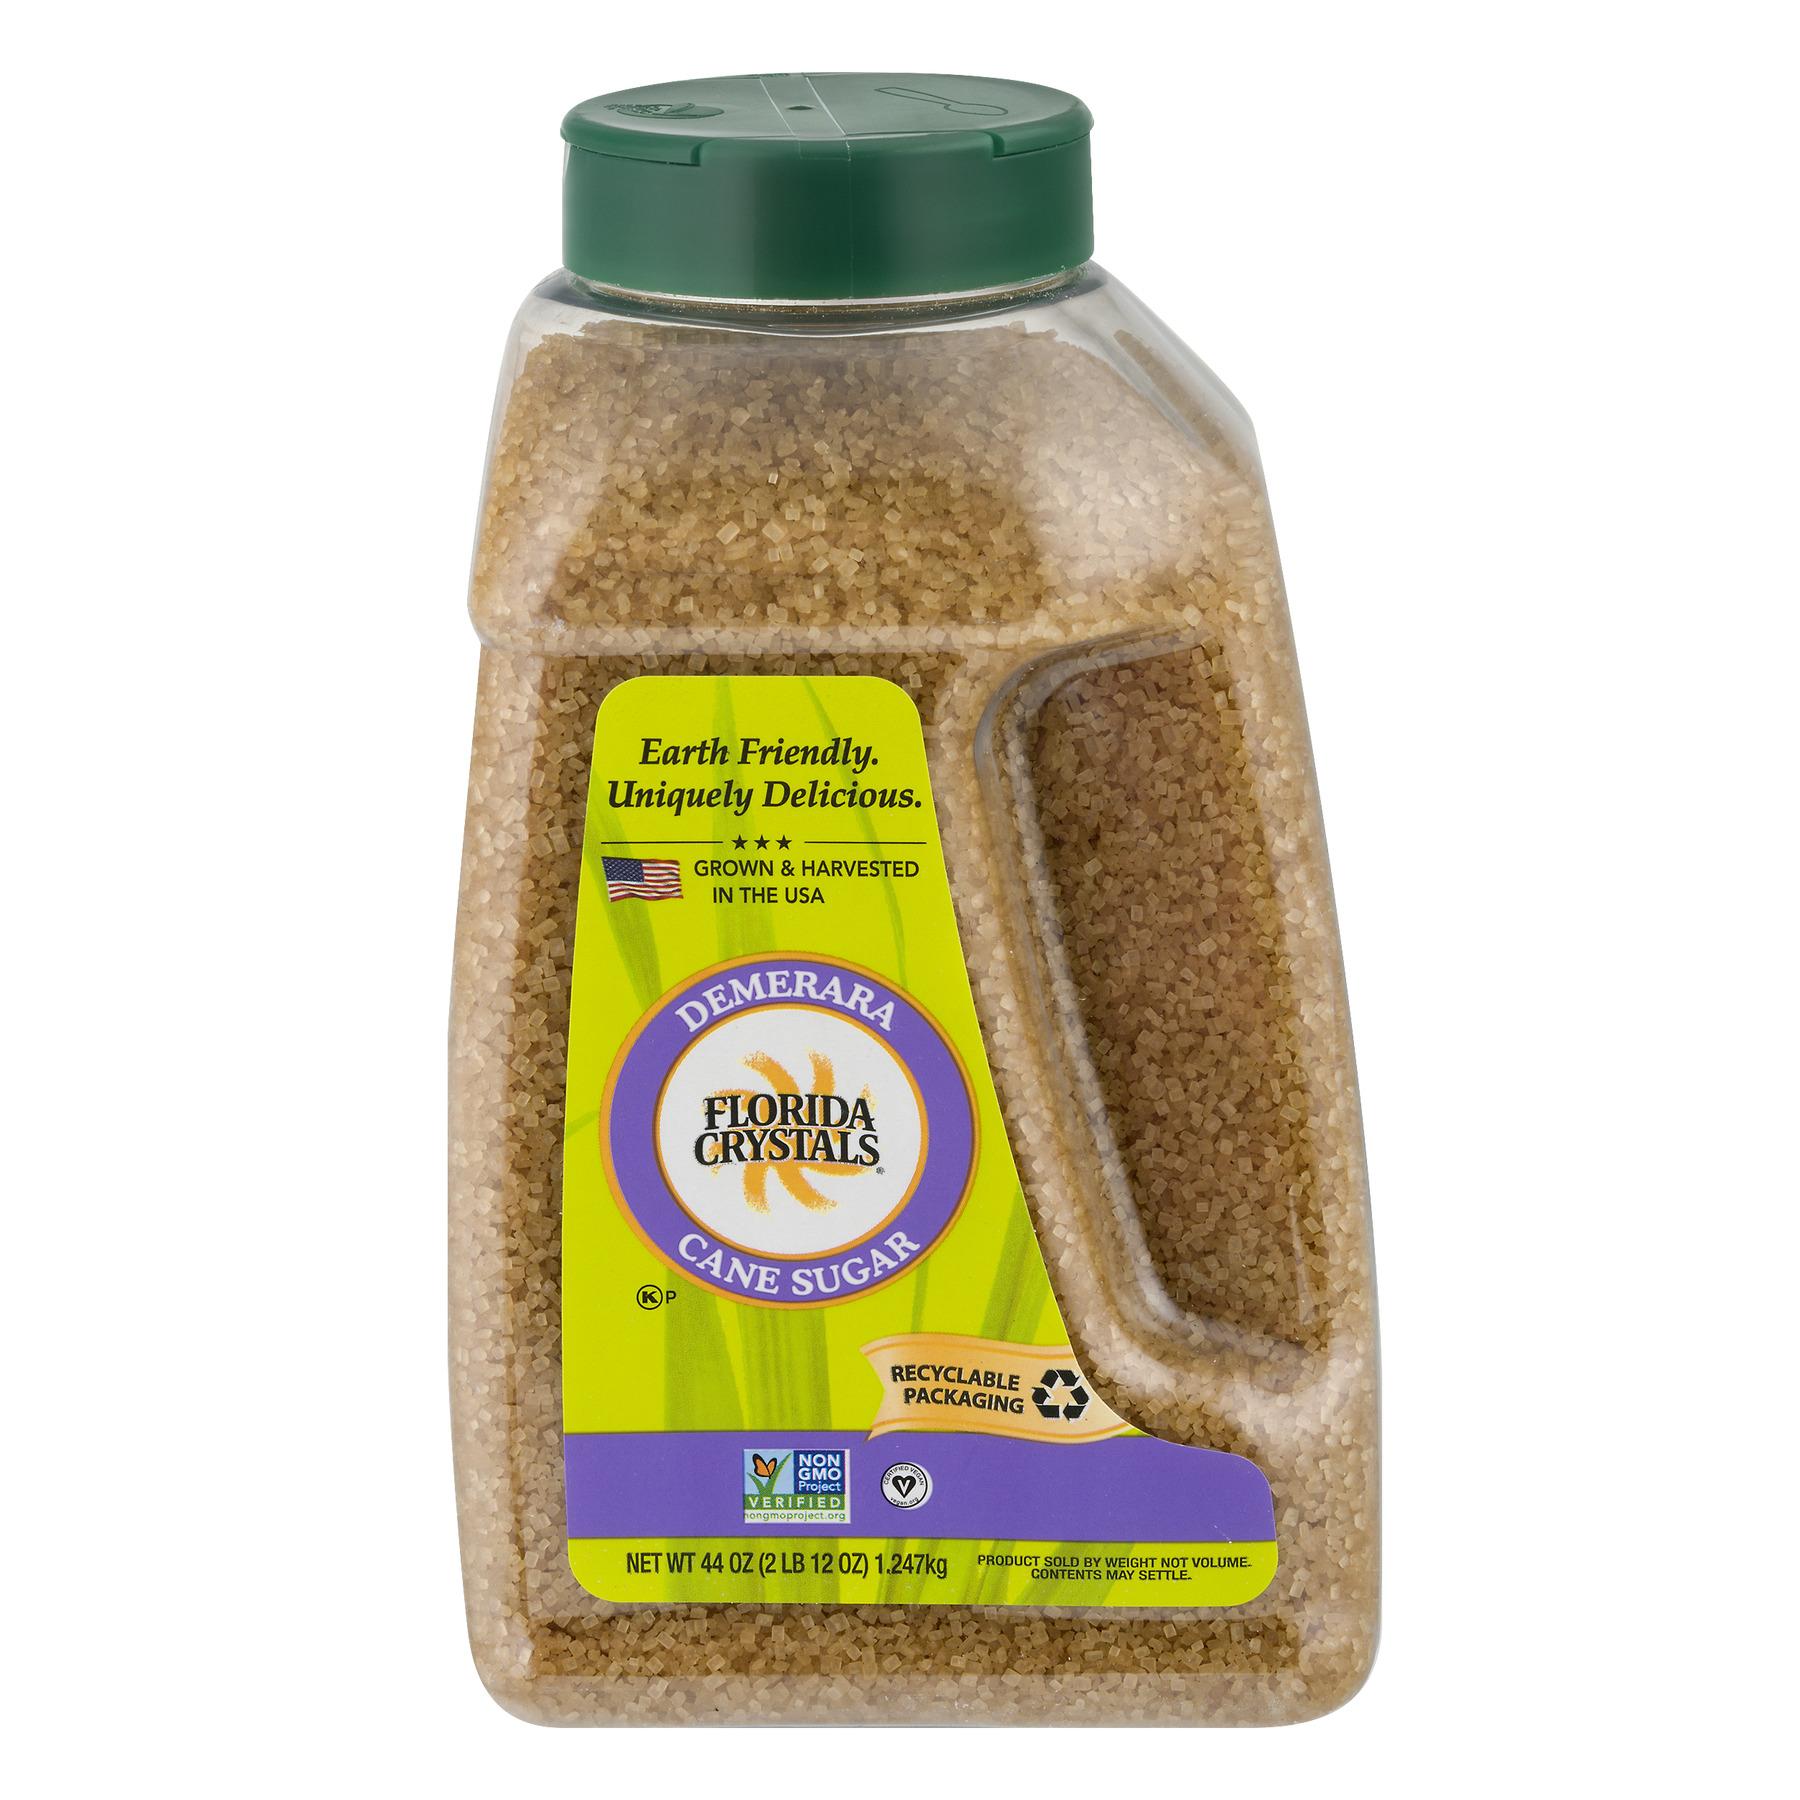 Florida Crystals: Demerara Cane Natural Sugar, 44 Oz